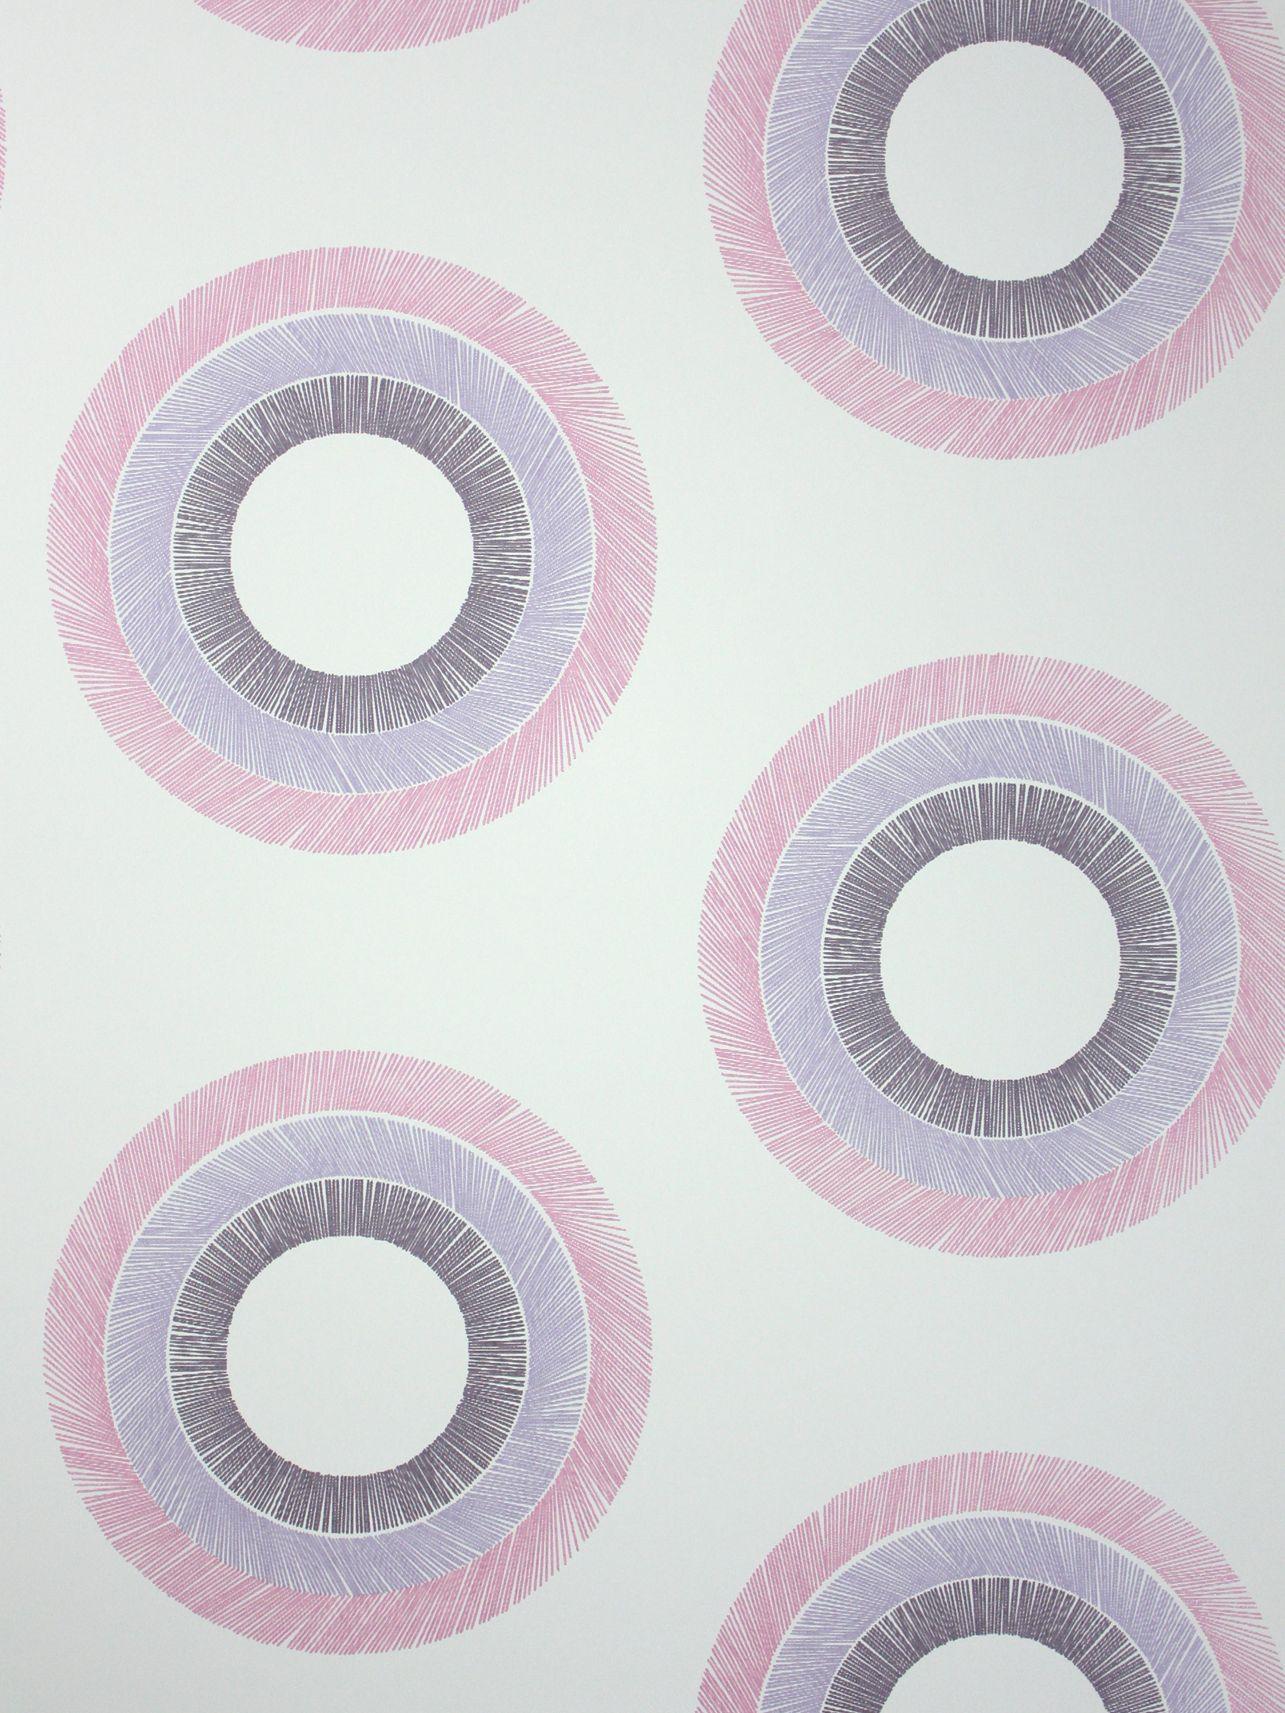 Osborne & Little Osborne & Little Parure Wallpaper